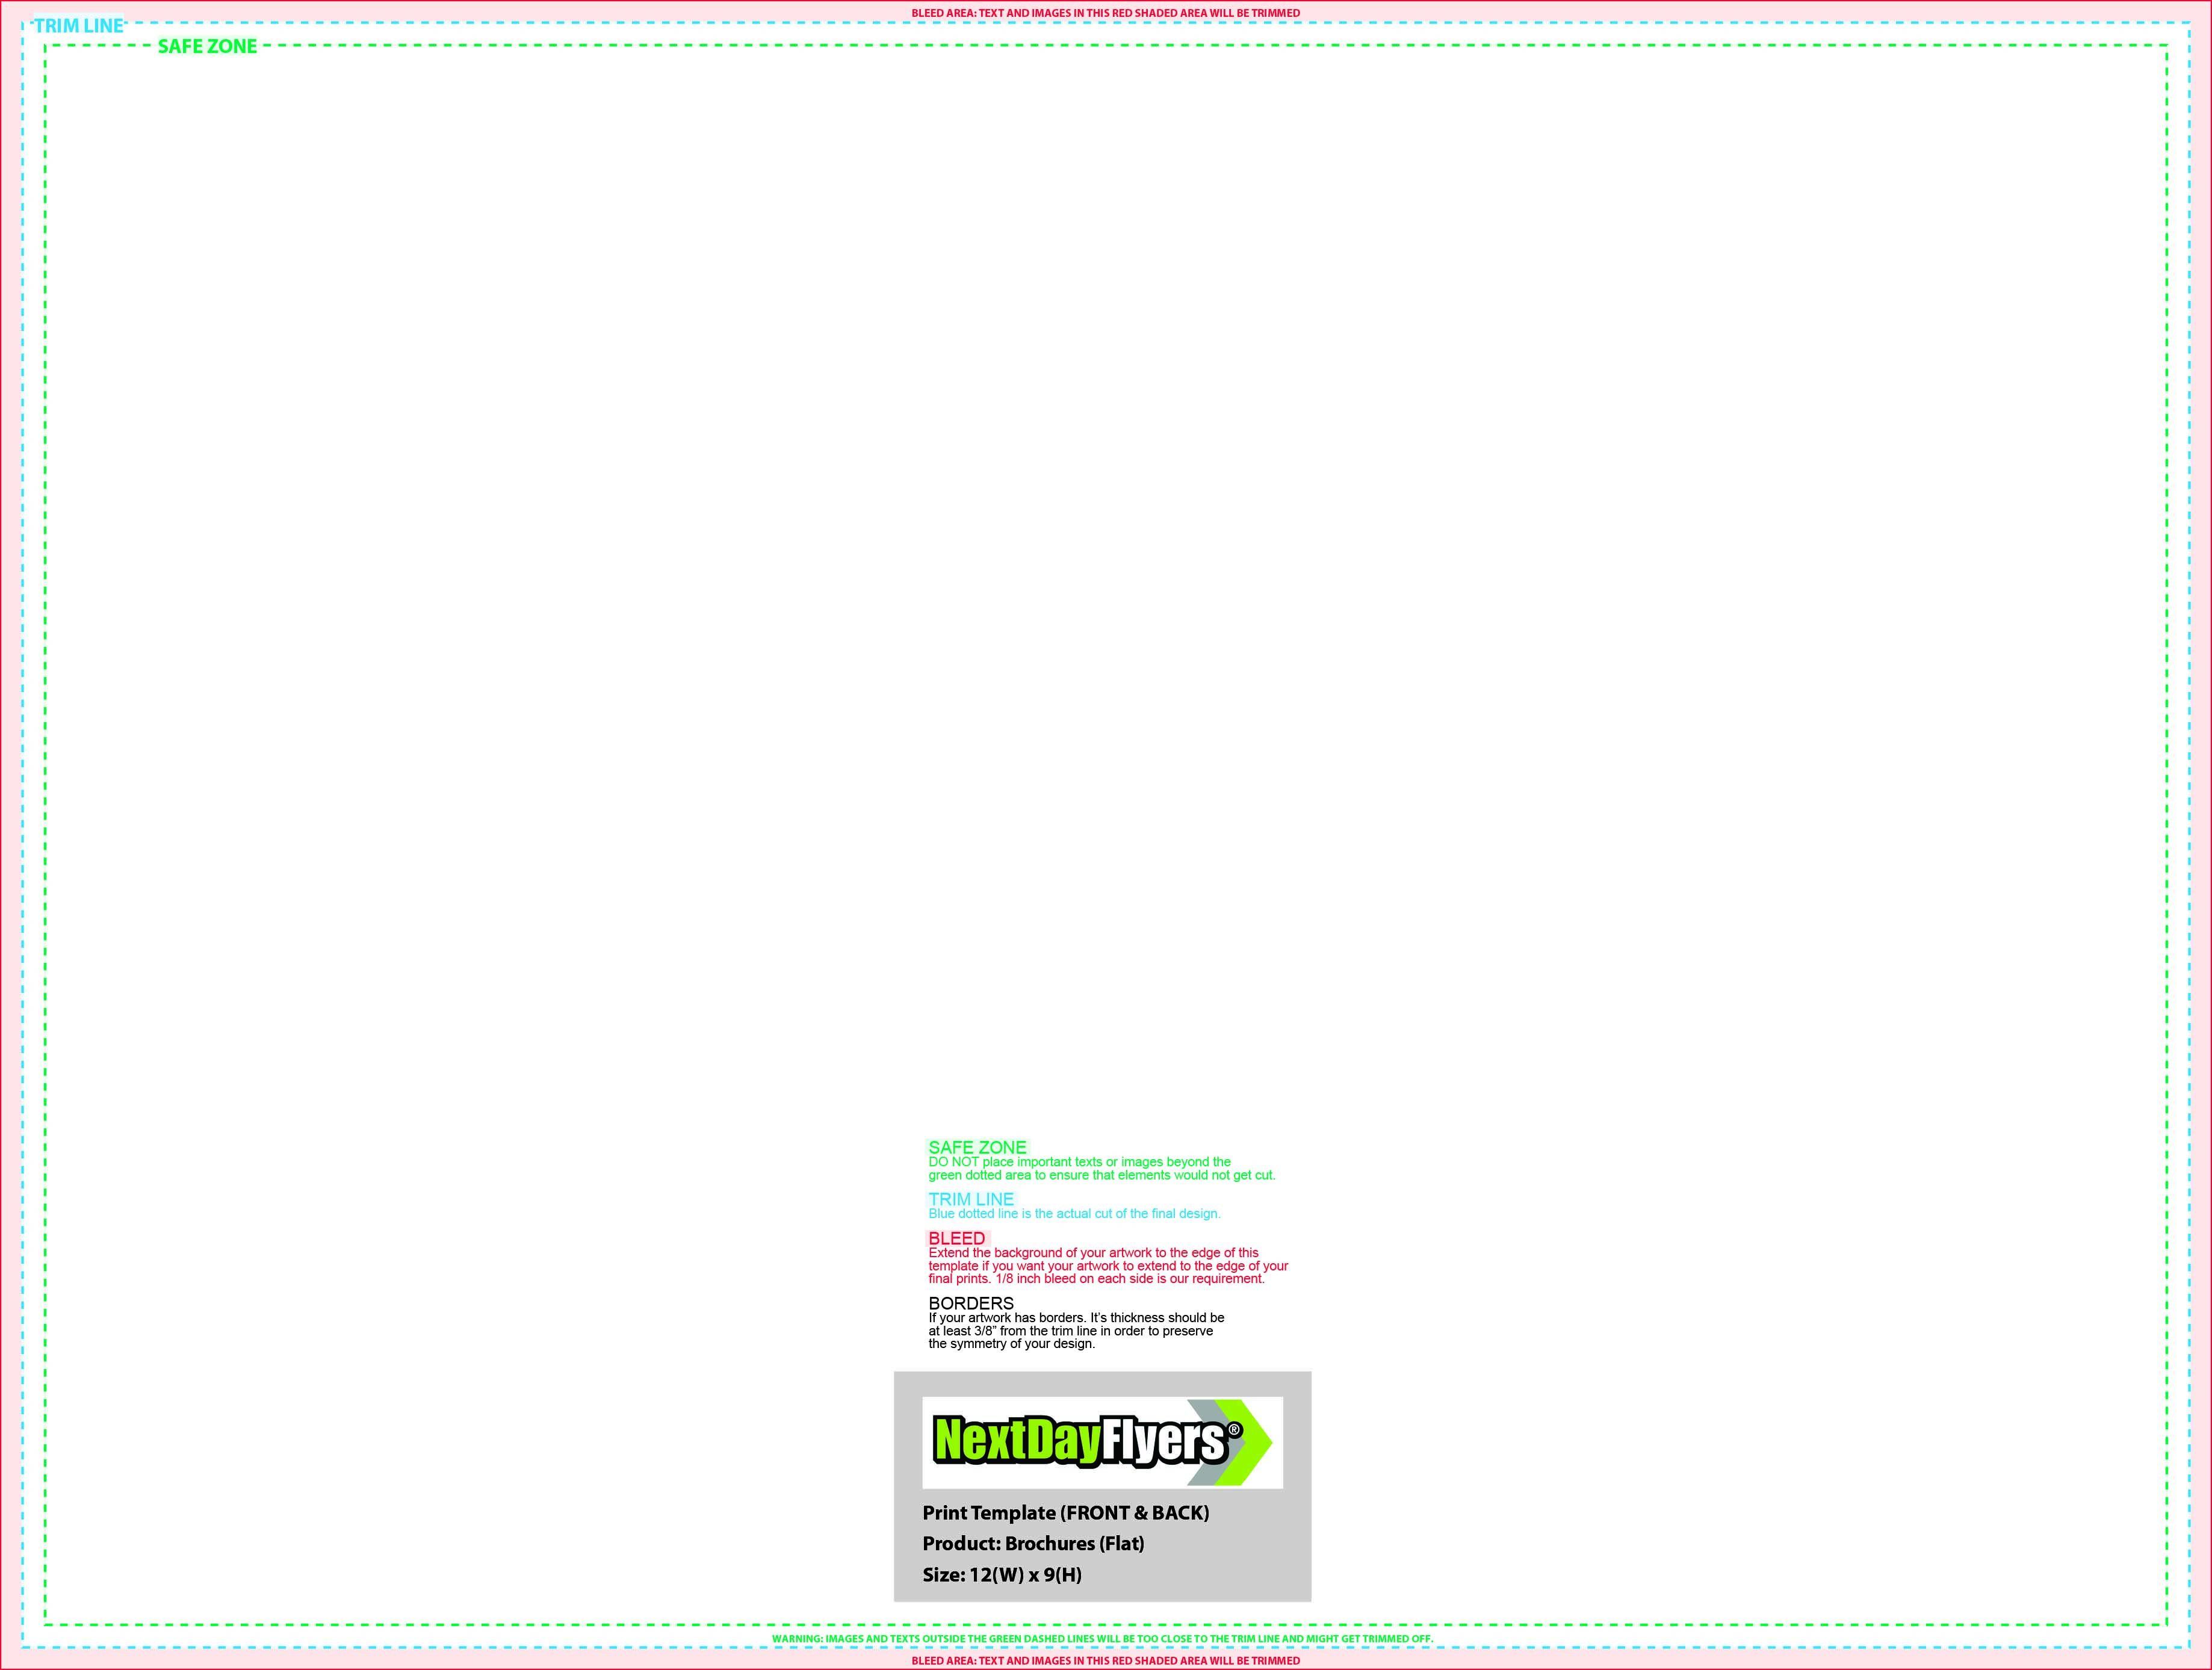 print fast bi fold brochures 1 day turnaround nextdayflyers